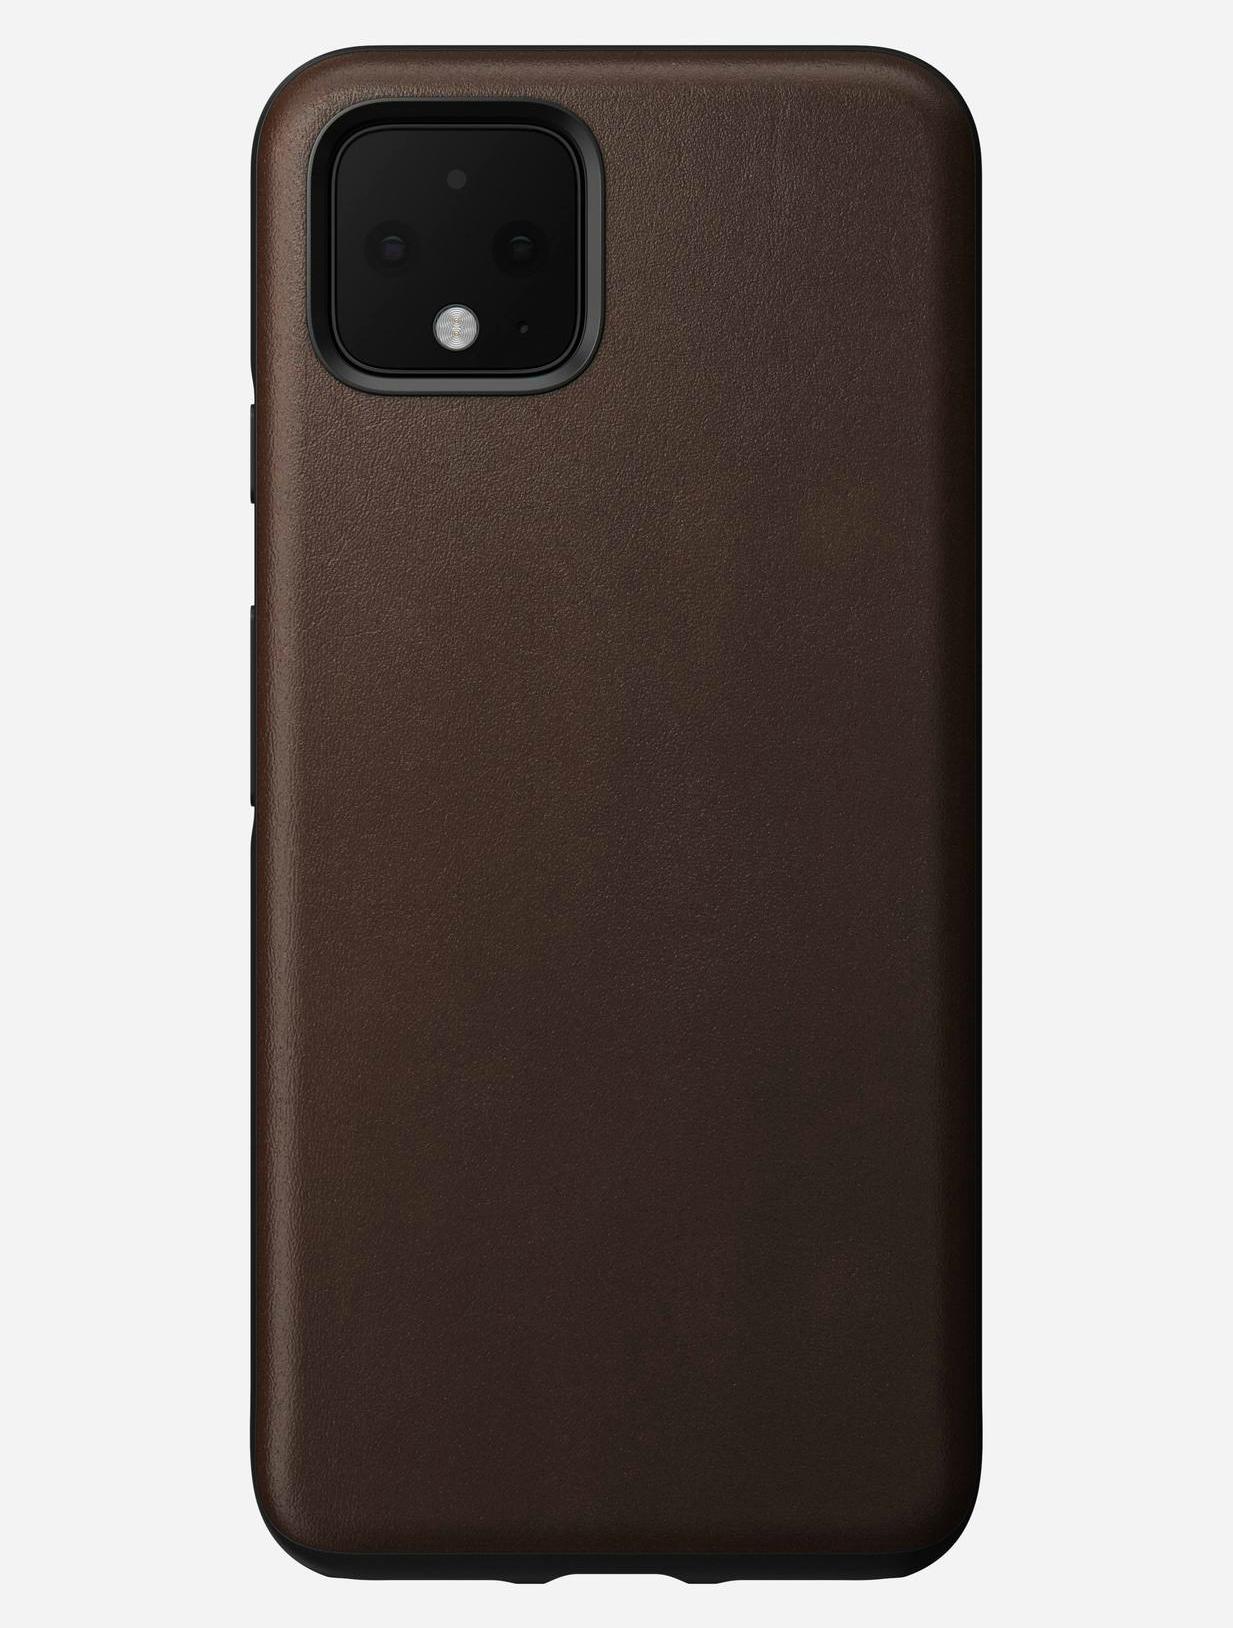 Nomad Δερμάτινη Rugged Θήκη Google Pixel 4 - Rustic Brown (NM2TRR0100)